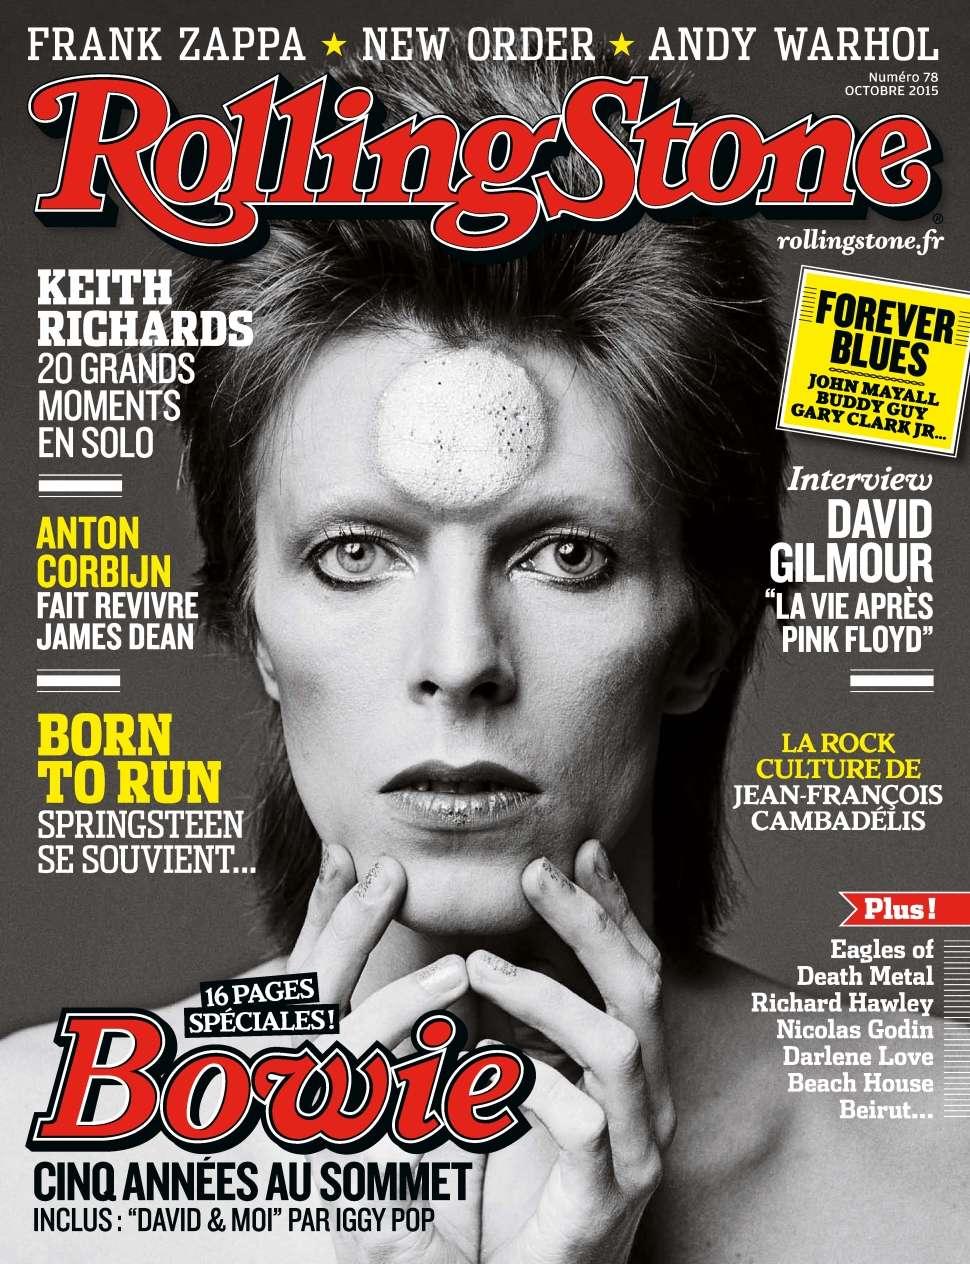 Rolling Stone 78 - Octobre 2015